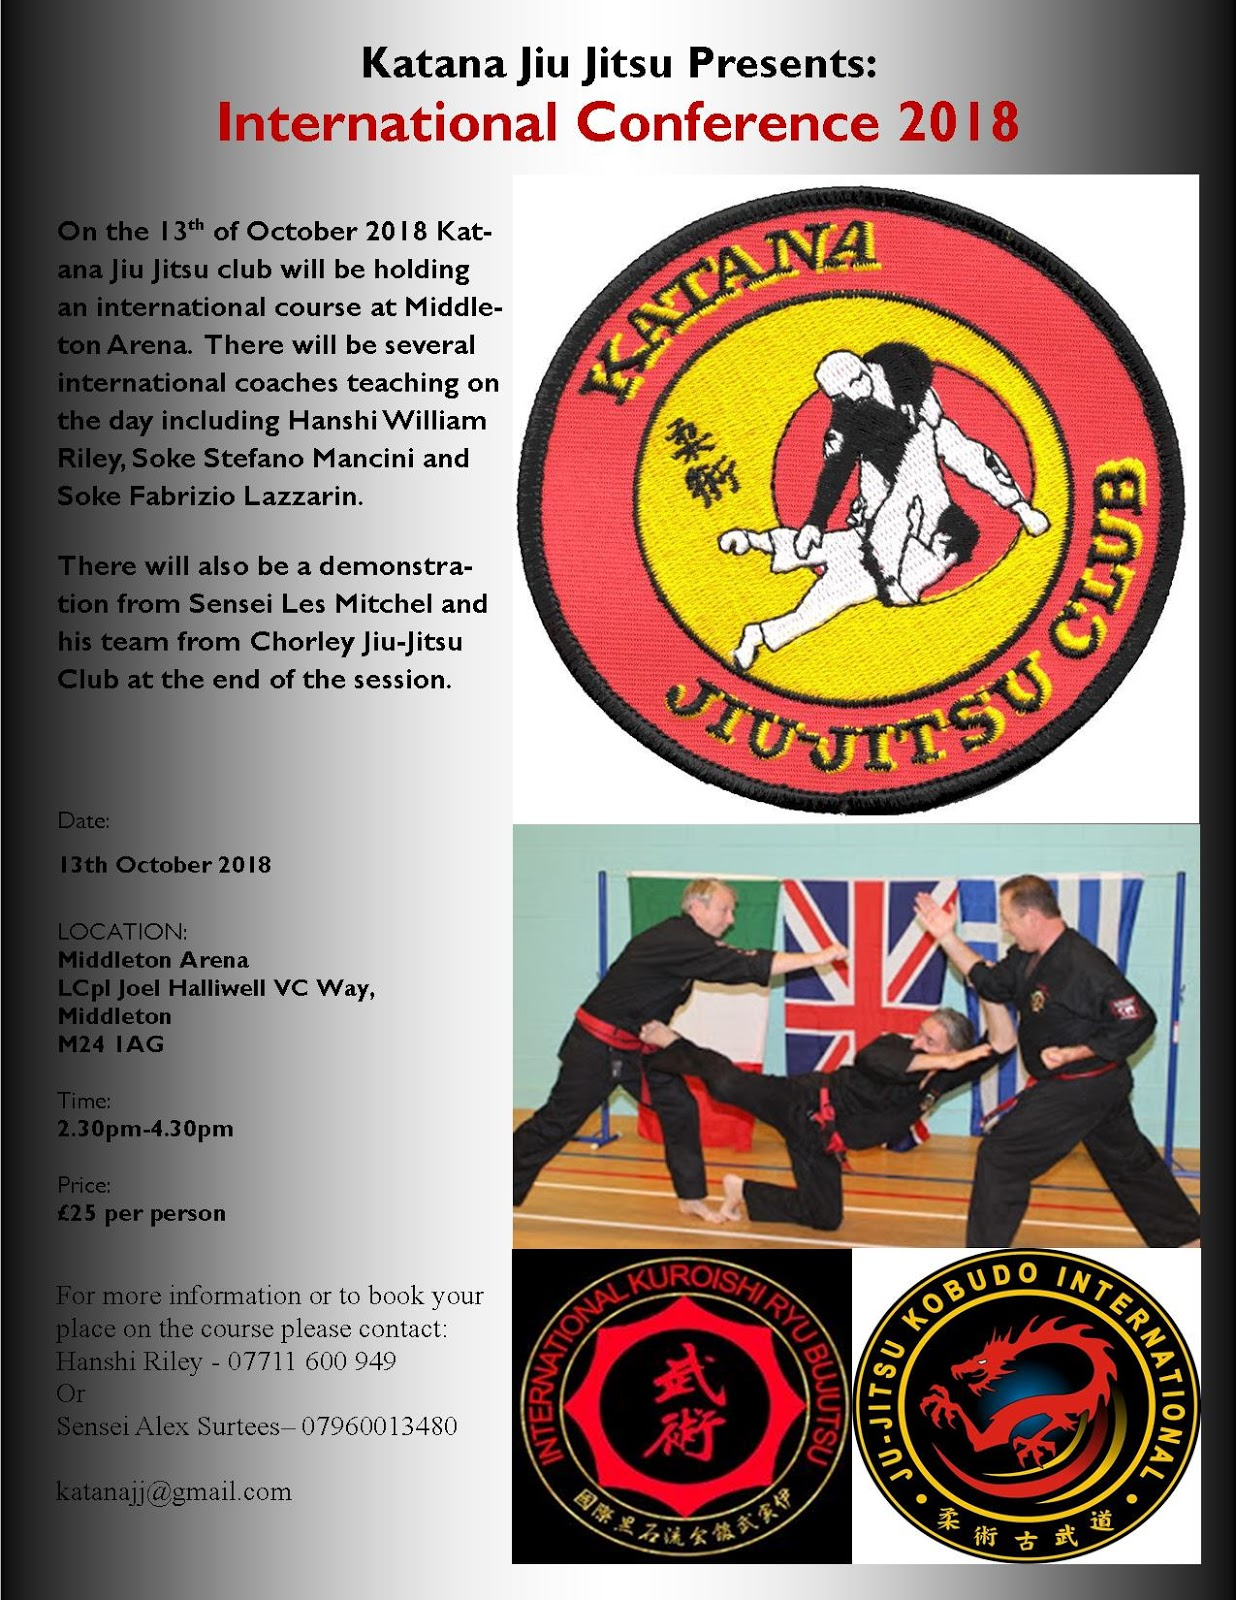 Katana Jiu Jitsu Club: Courses and Events